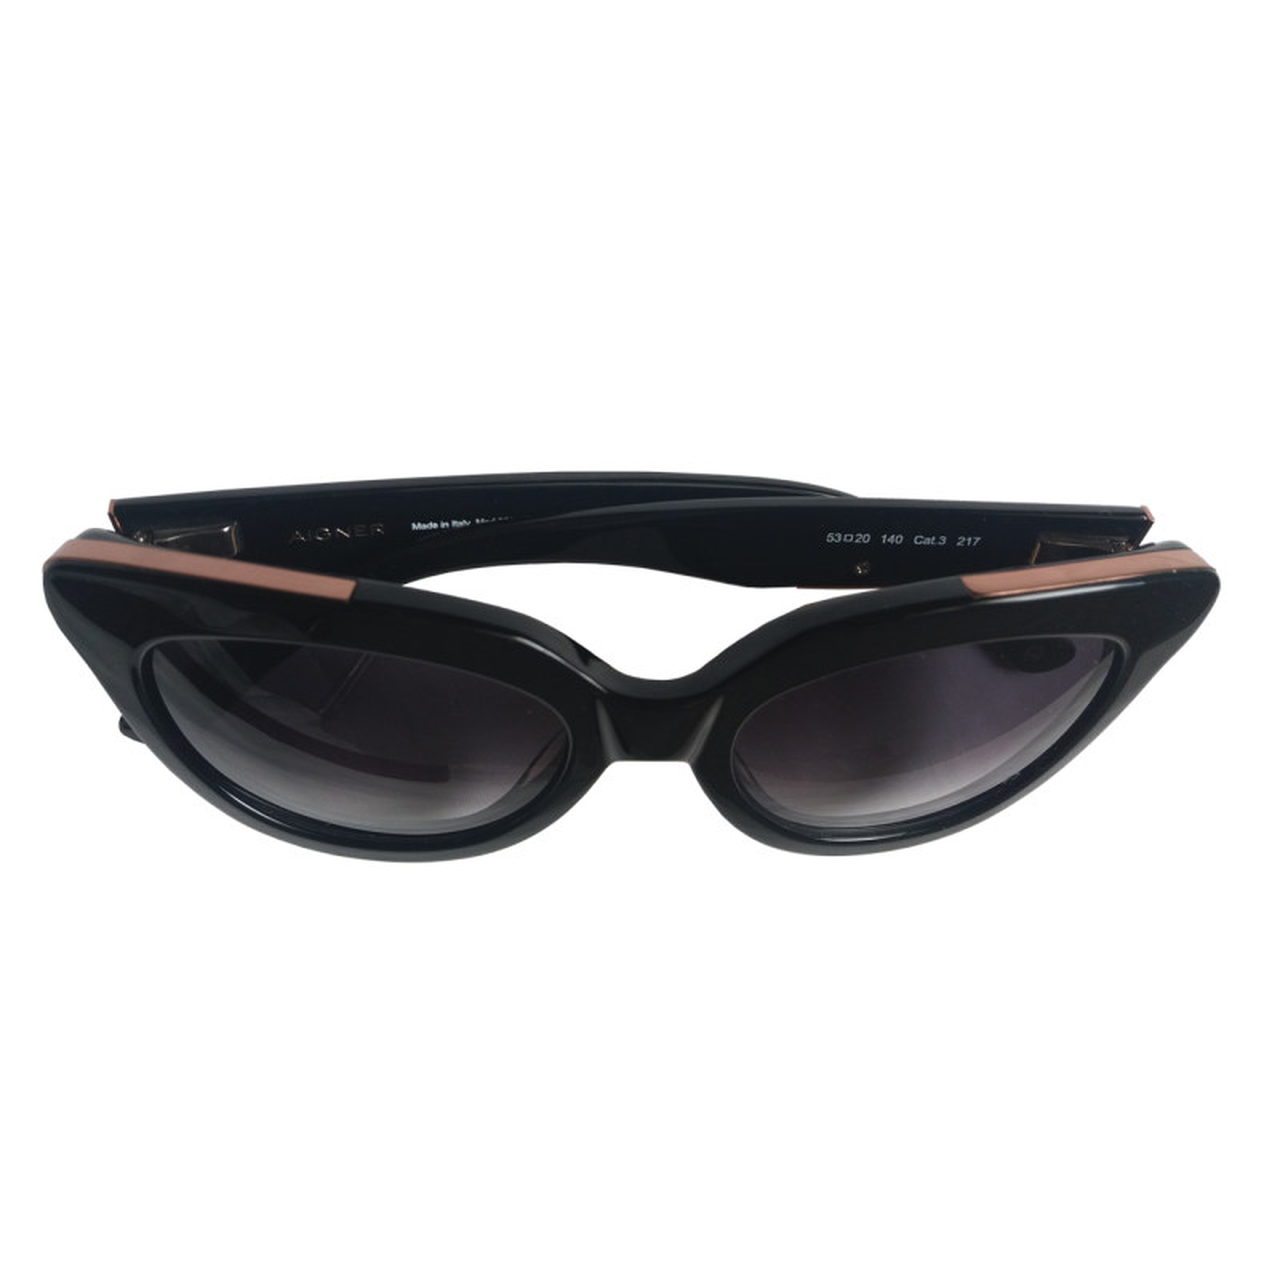 عینک آفتابی زنانه اگنر مدل 00771-35025